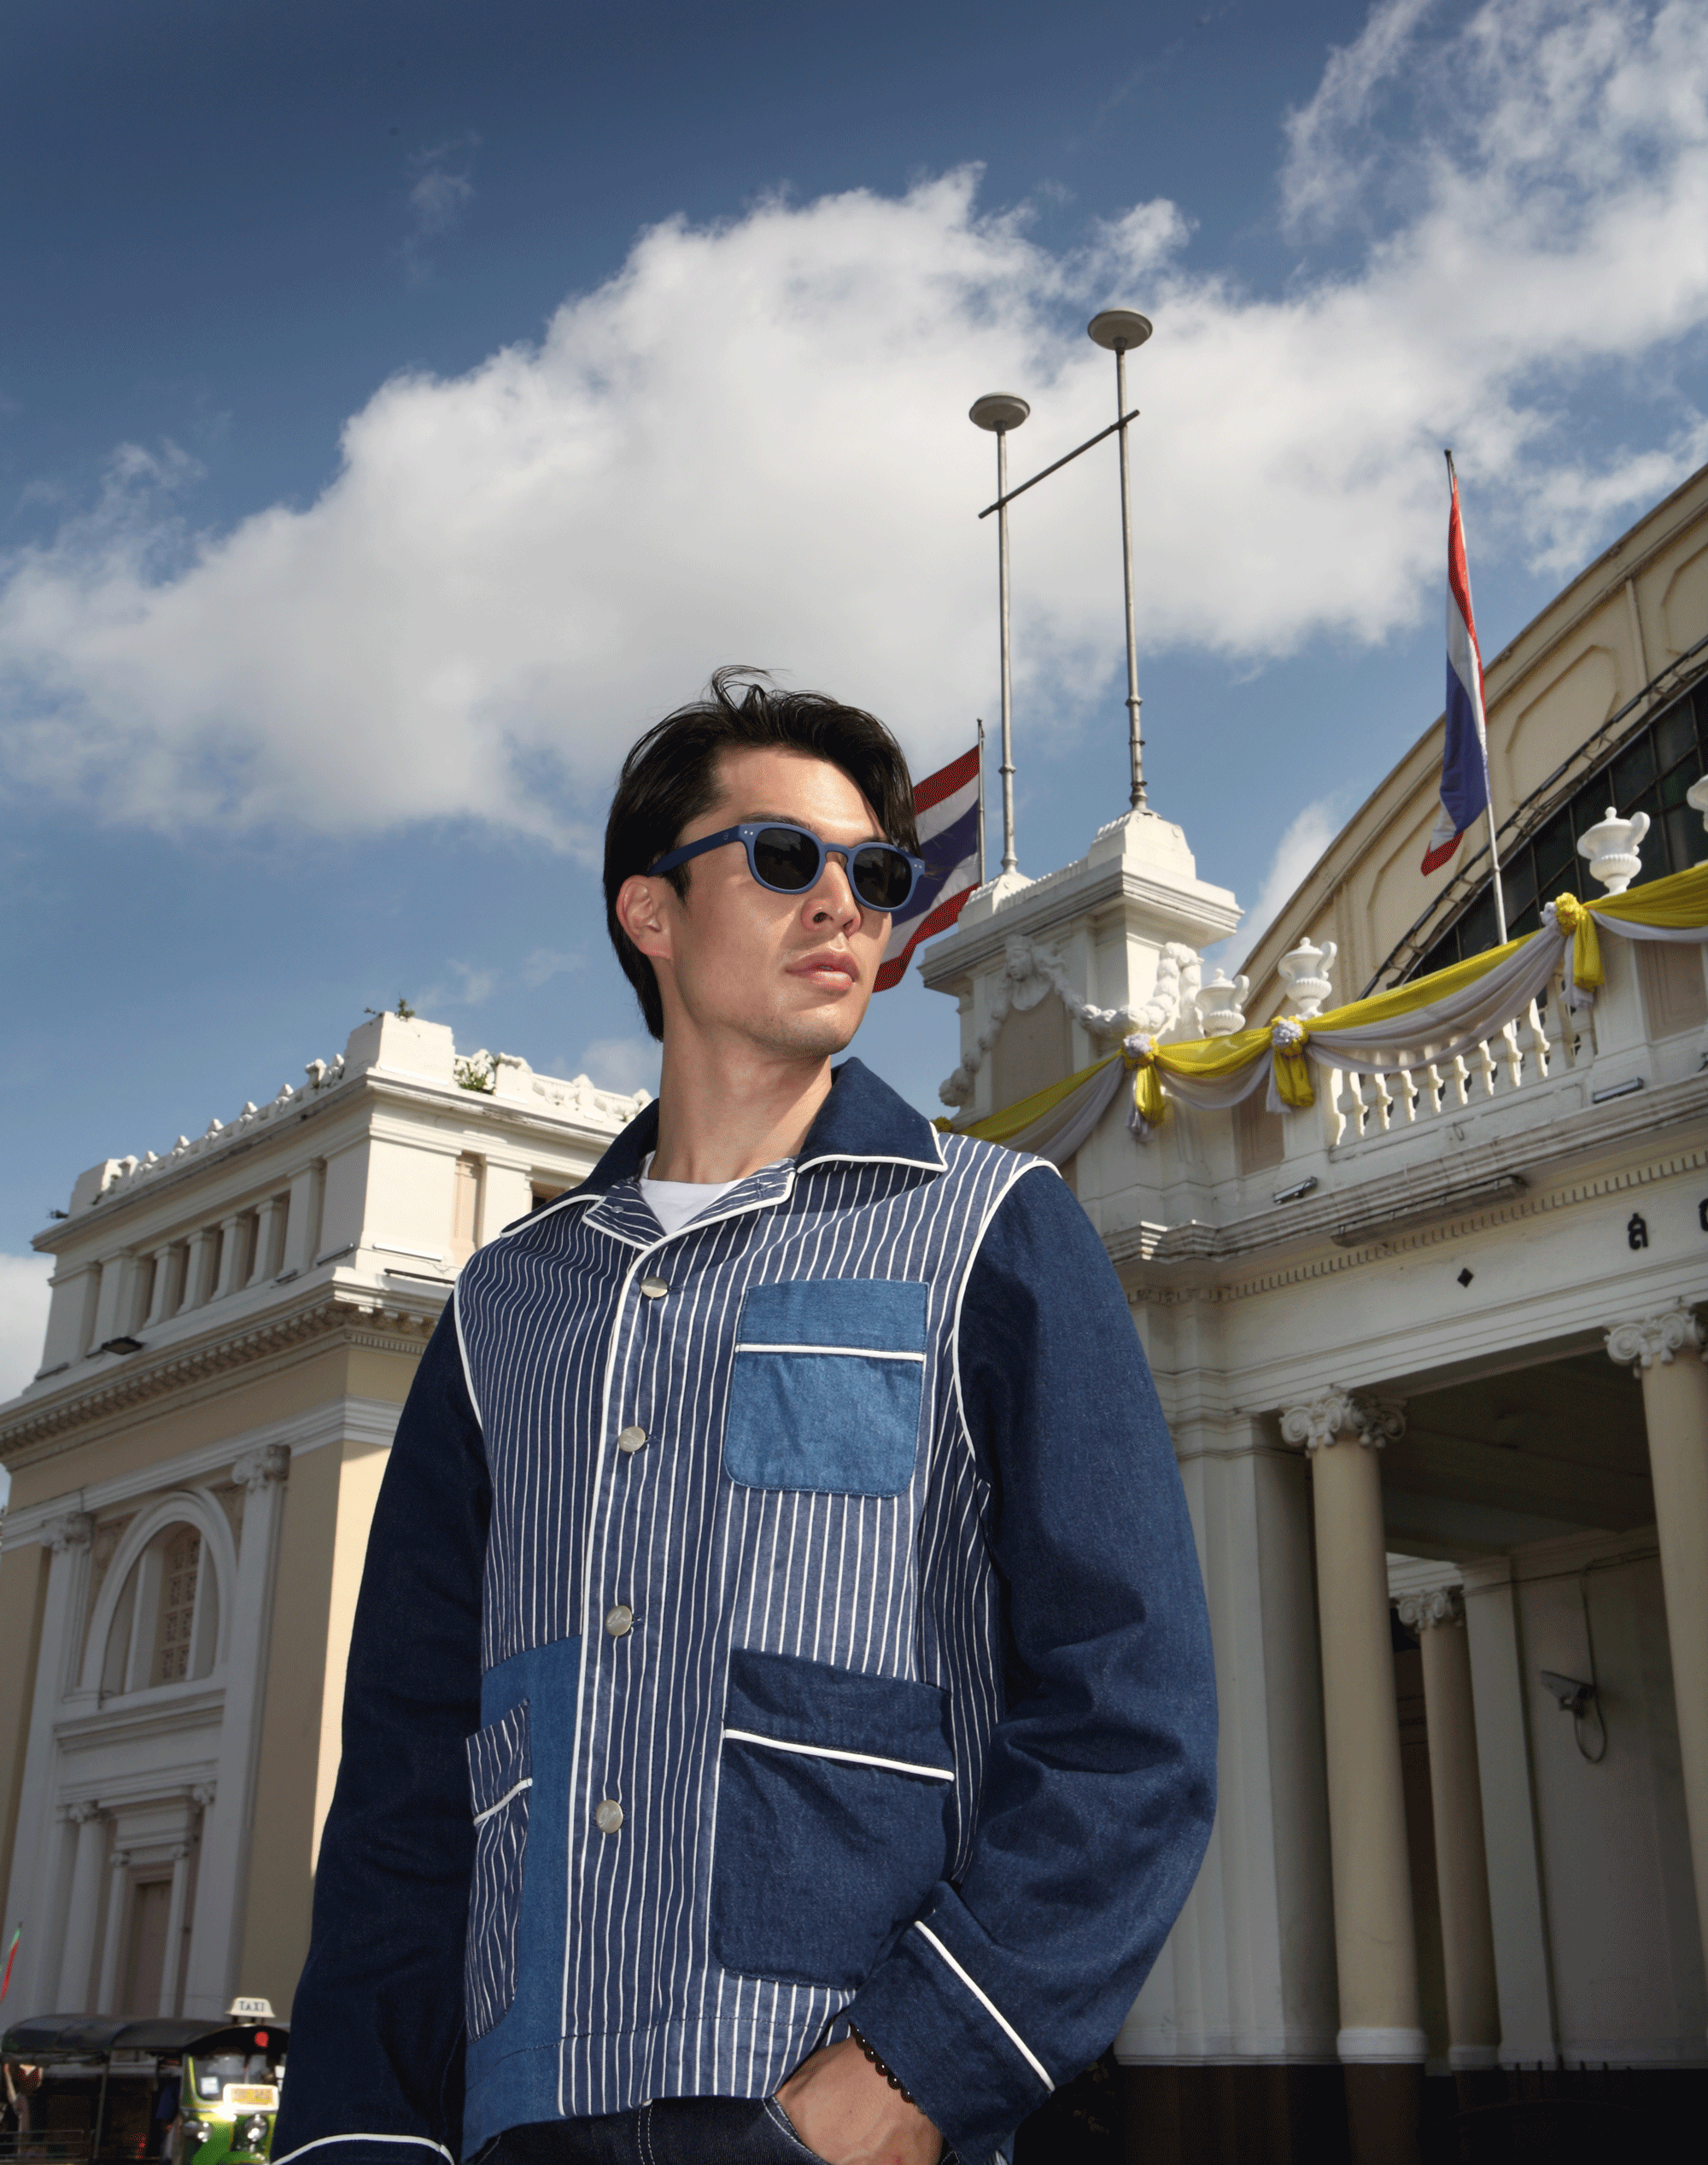 clothes : Everyday Karmakamet / sunglasses : IZIPIZI